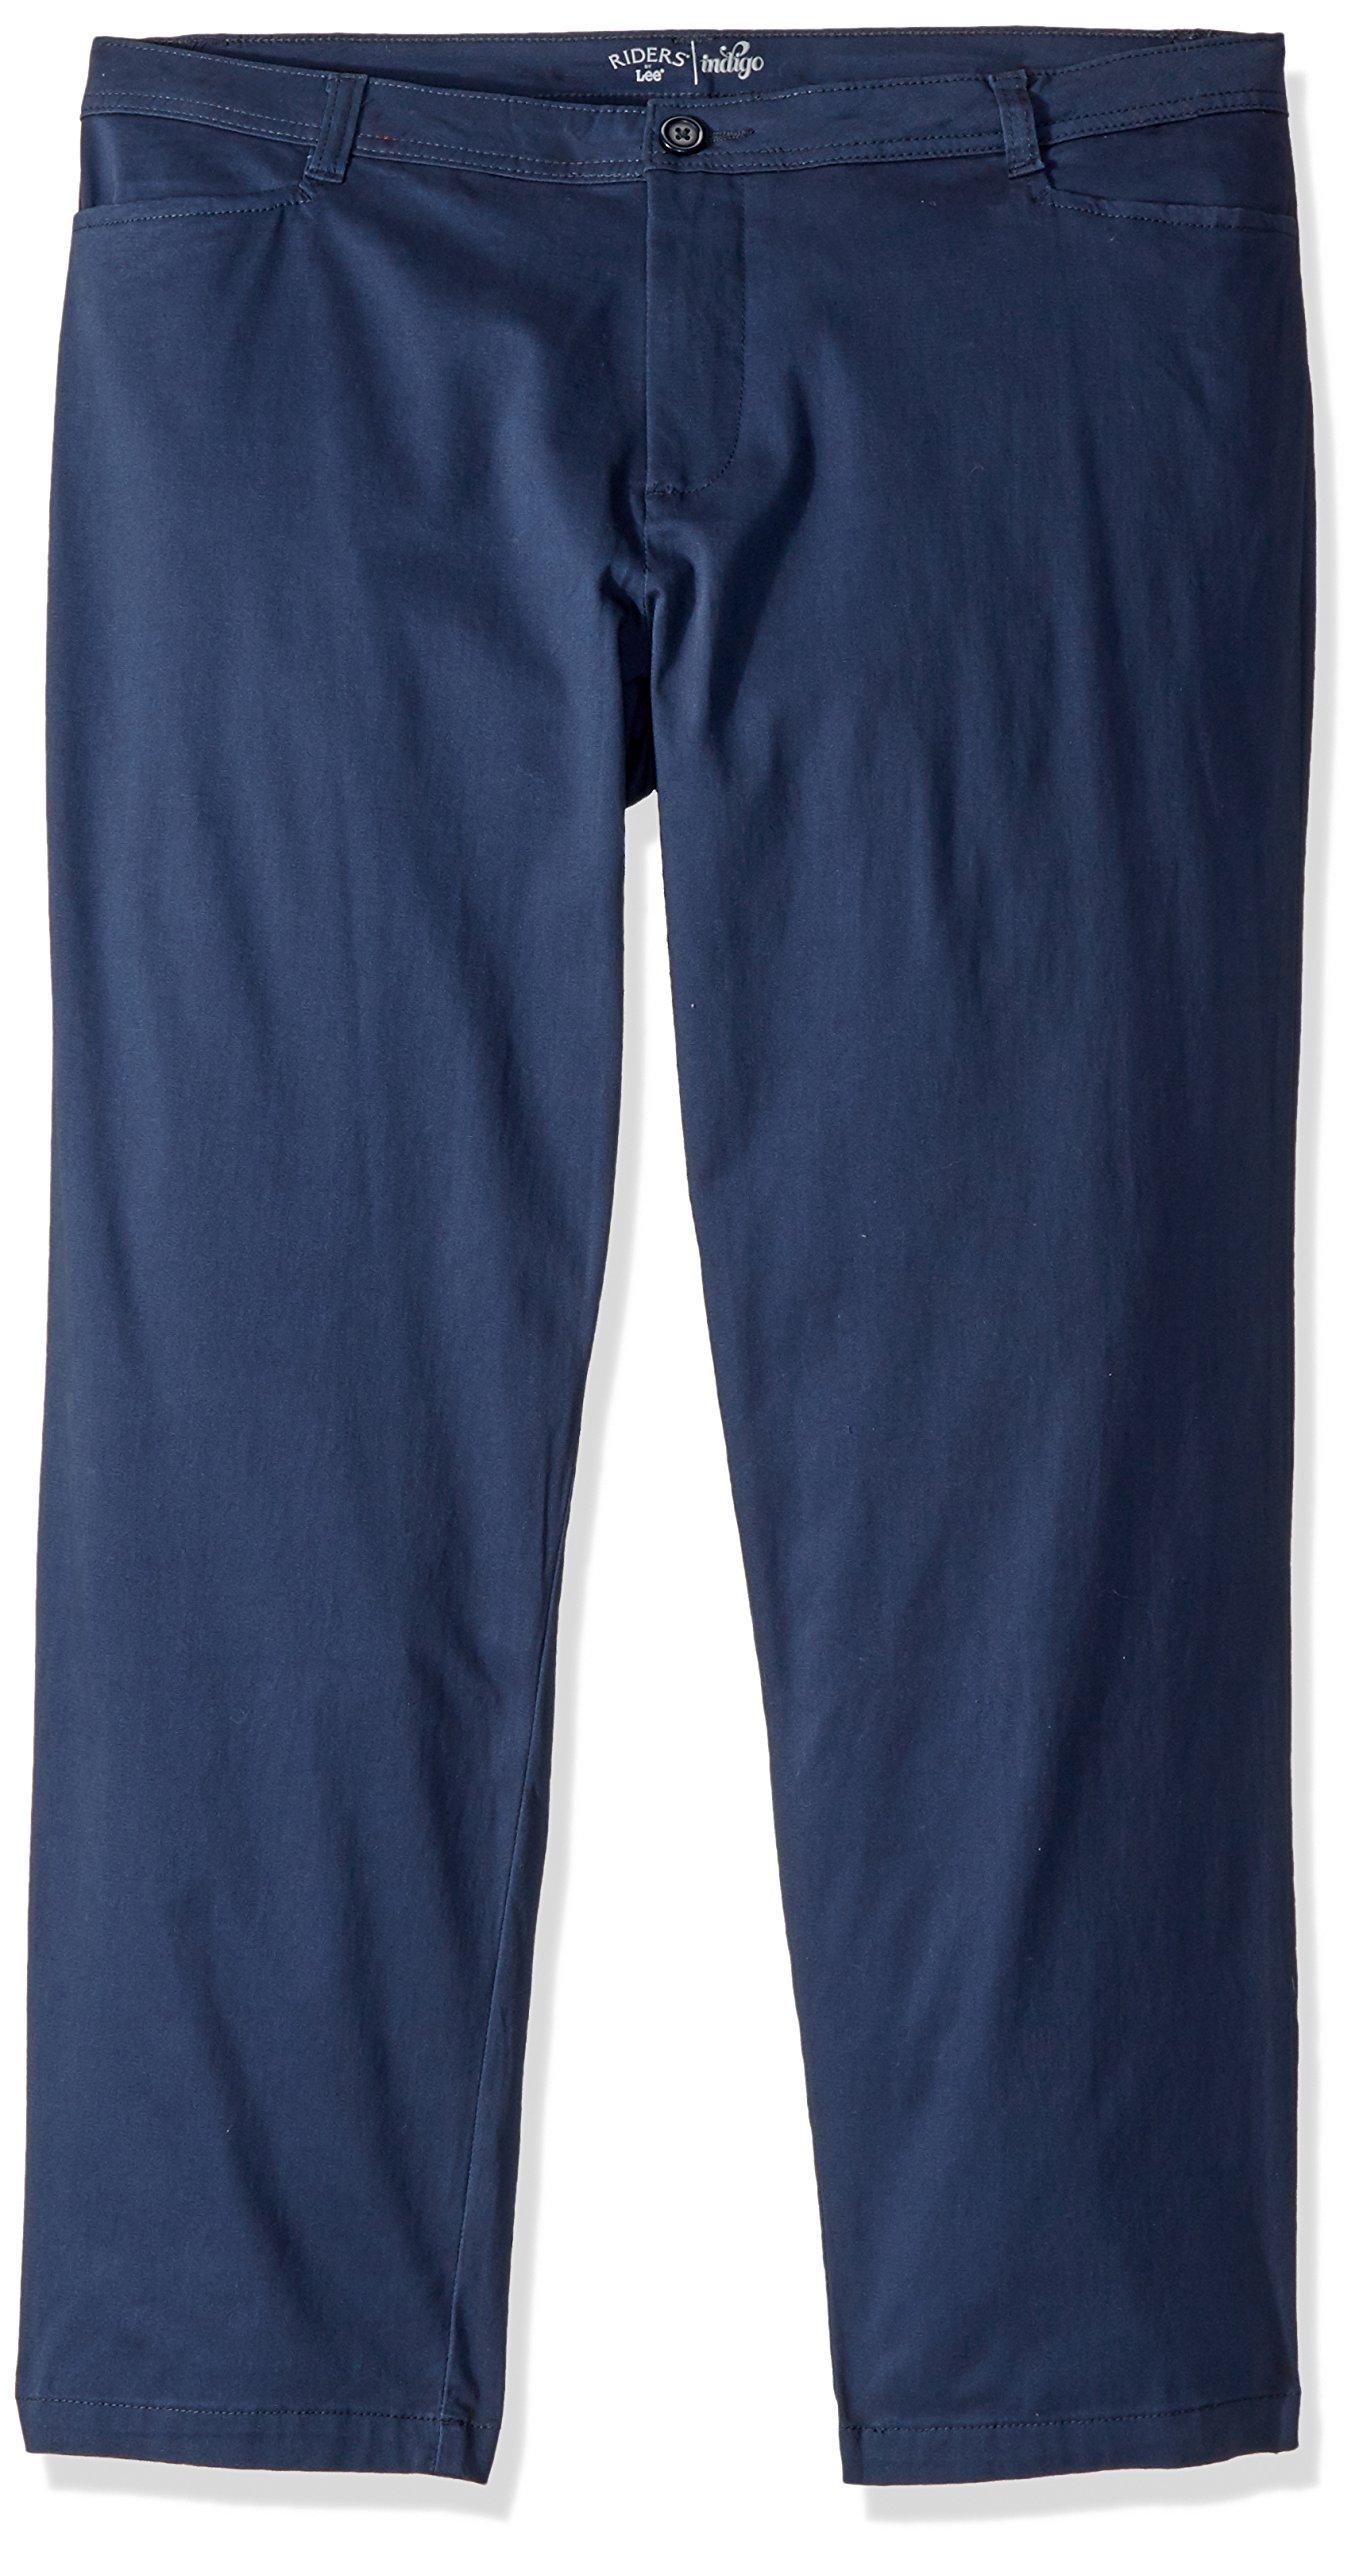 Riders by Lee Indigo Women's Petite-Plus-Size Straight Leg Casual Twill Pant, Dress Blues, 22W Petite